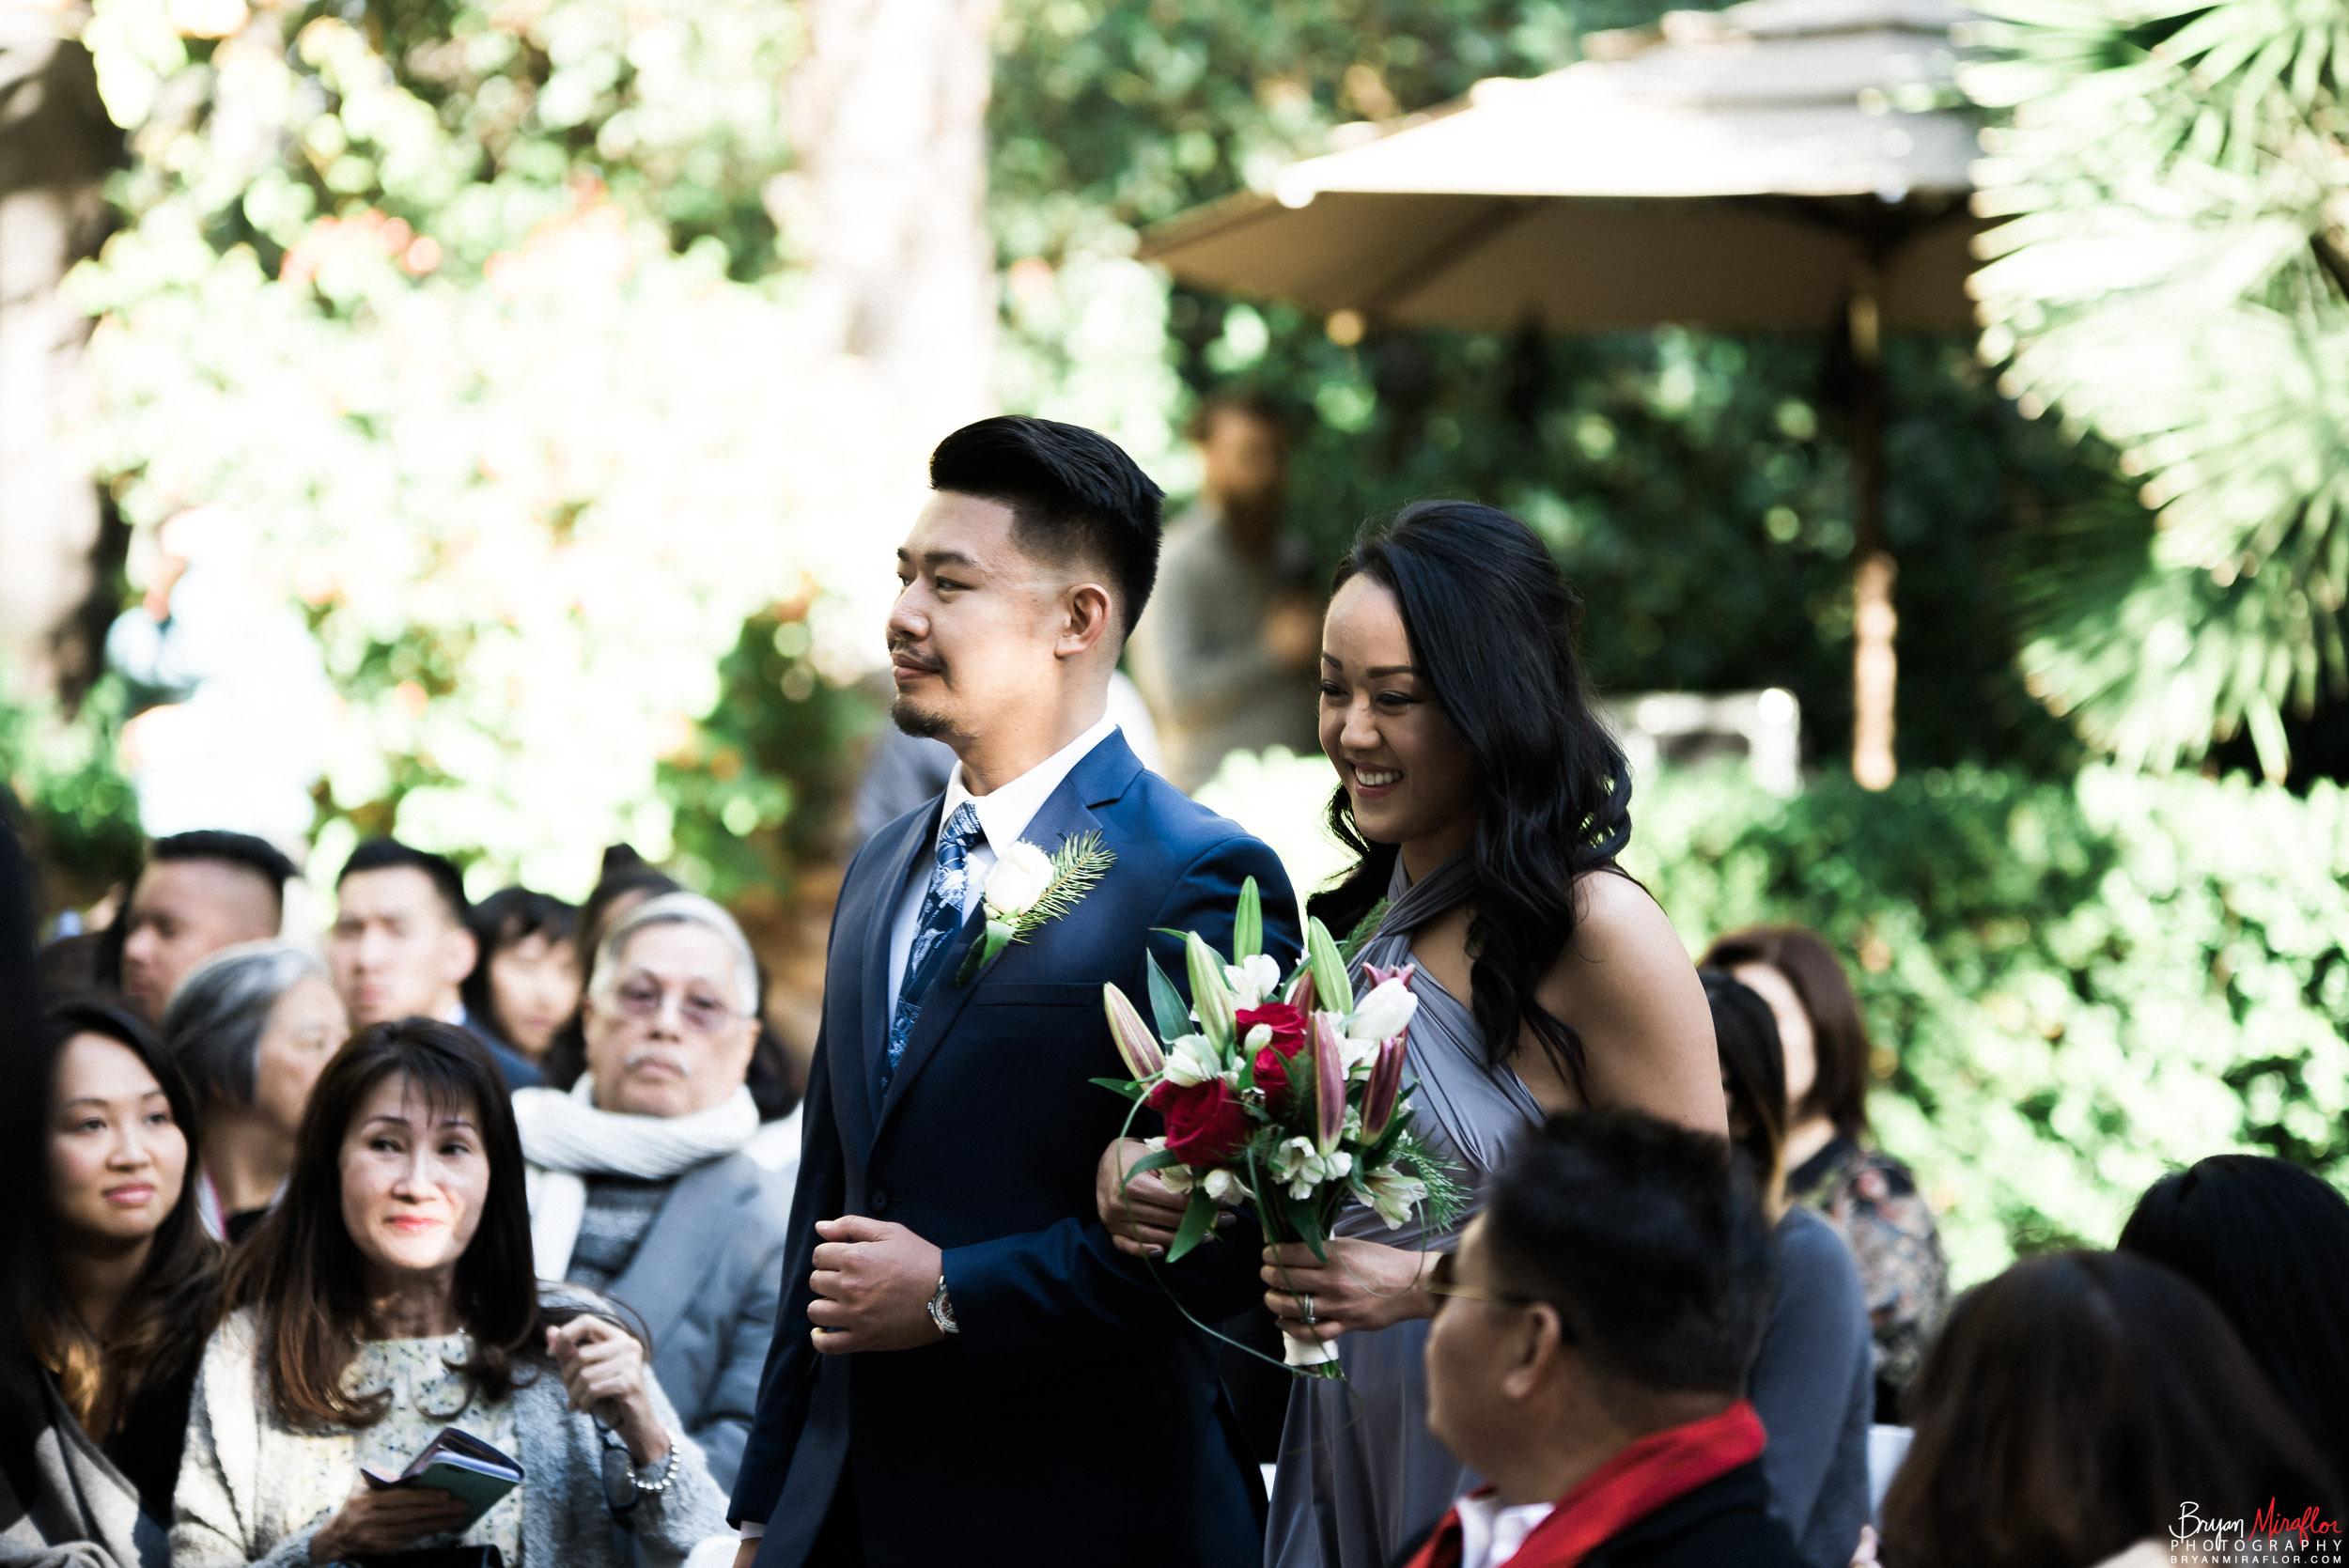 Bryan-Miraflor-Photography-Hannah-Jonathan-Married-Grand-Traditions-Estate-Gardens-Fallbrook-20171222-085.jpg